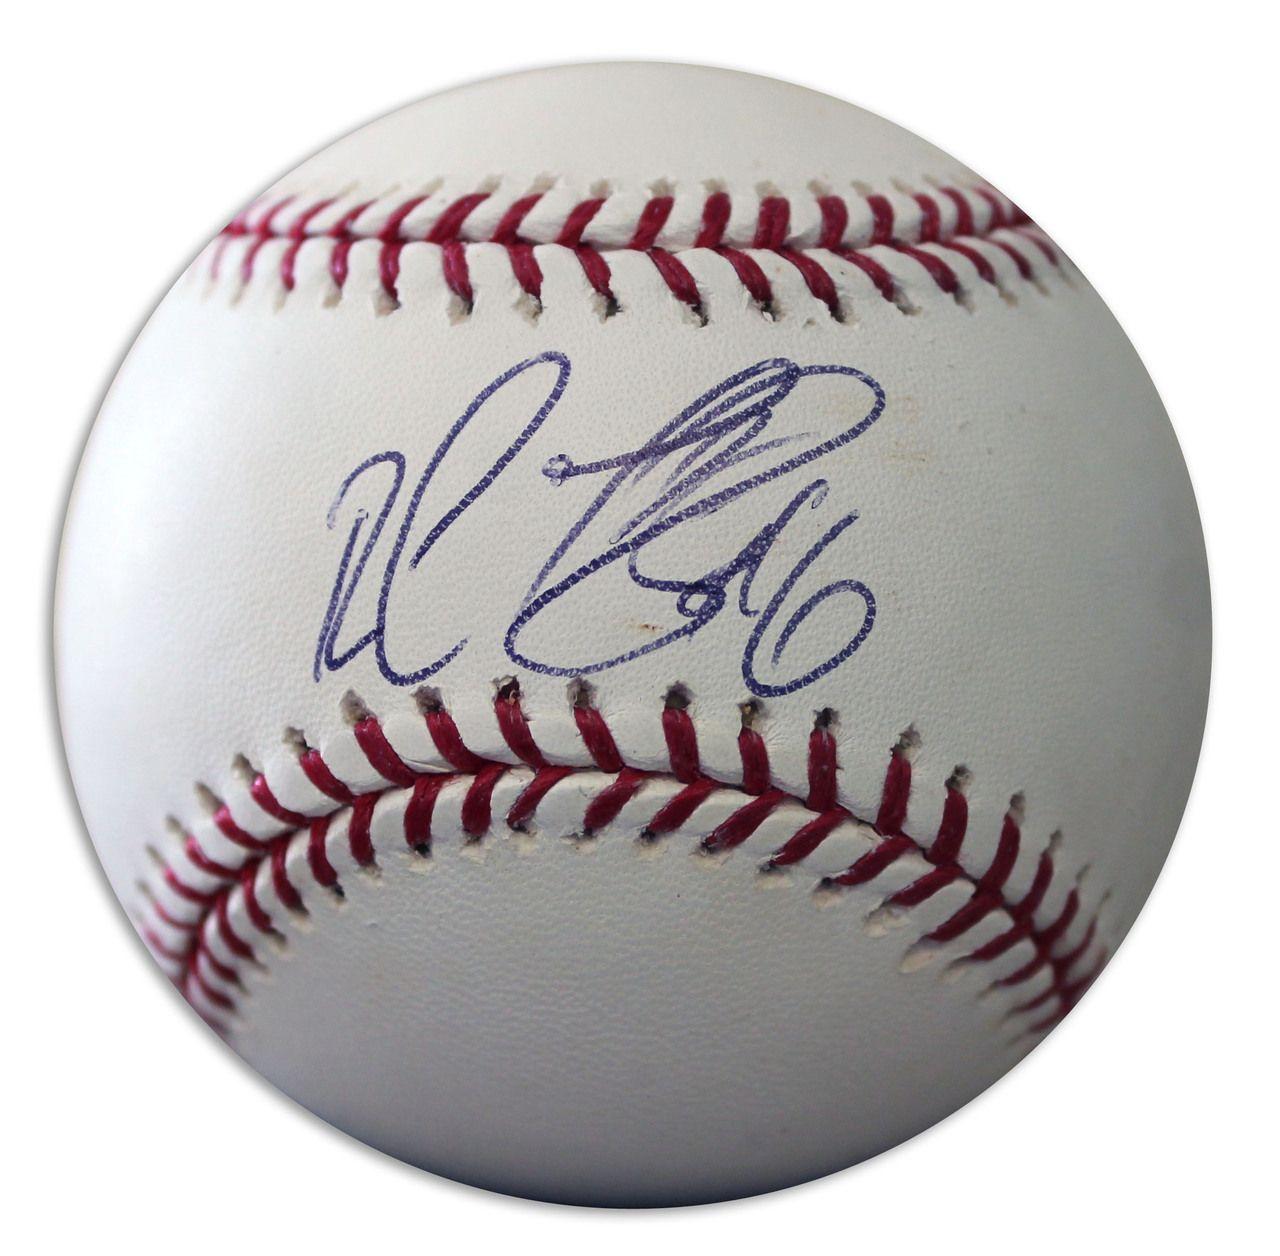 Ruben Gotay Autographed Official Mlb Baseball Mlb Mlb Baseball Autograph